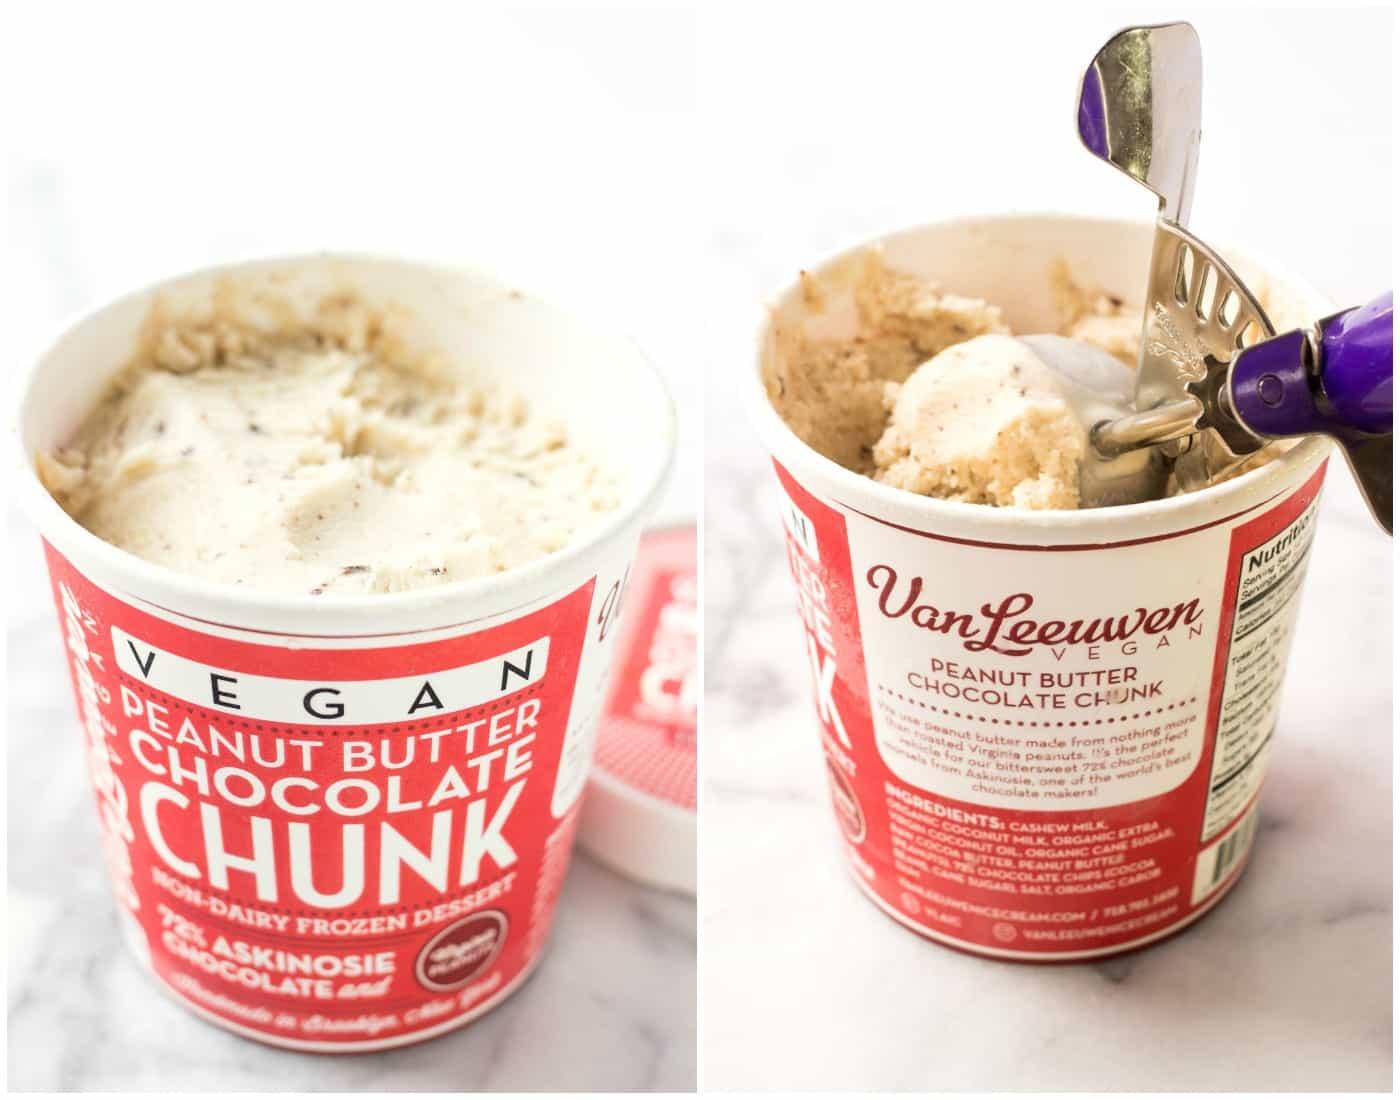 Van Leewen's Vegan Ice Cream -- the BEST ice cream I've ever tasted and you'd NEVER know it was vegan!